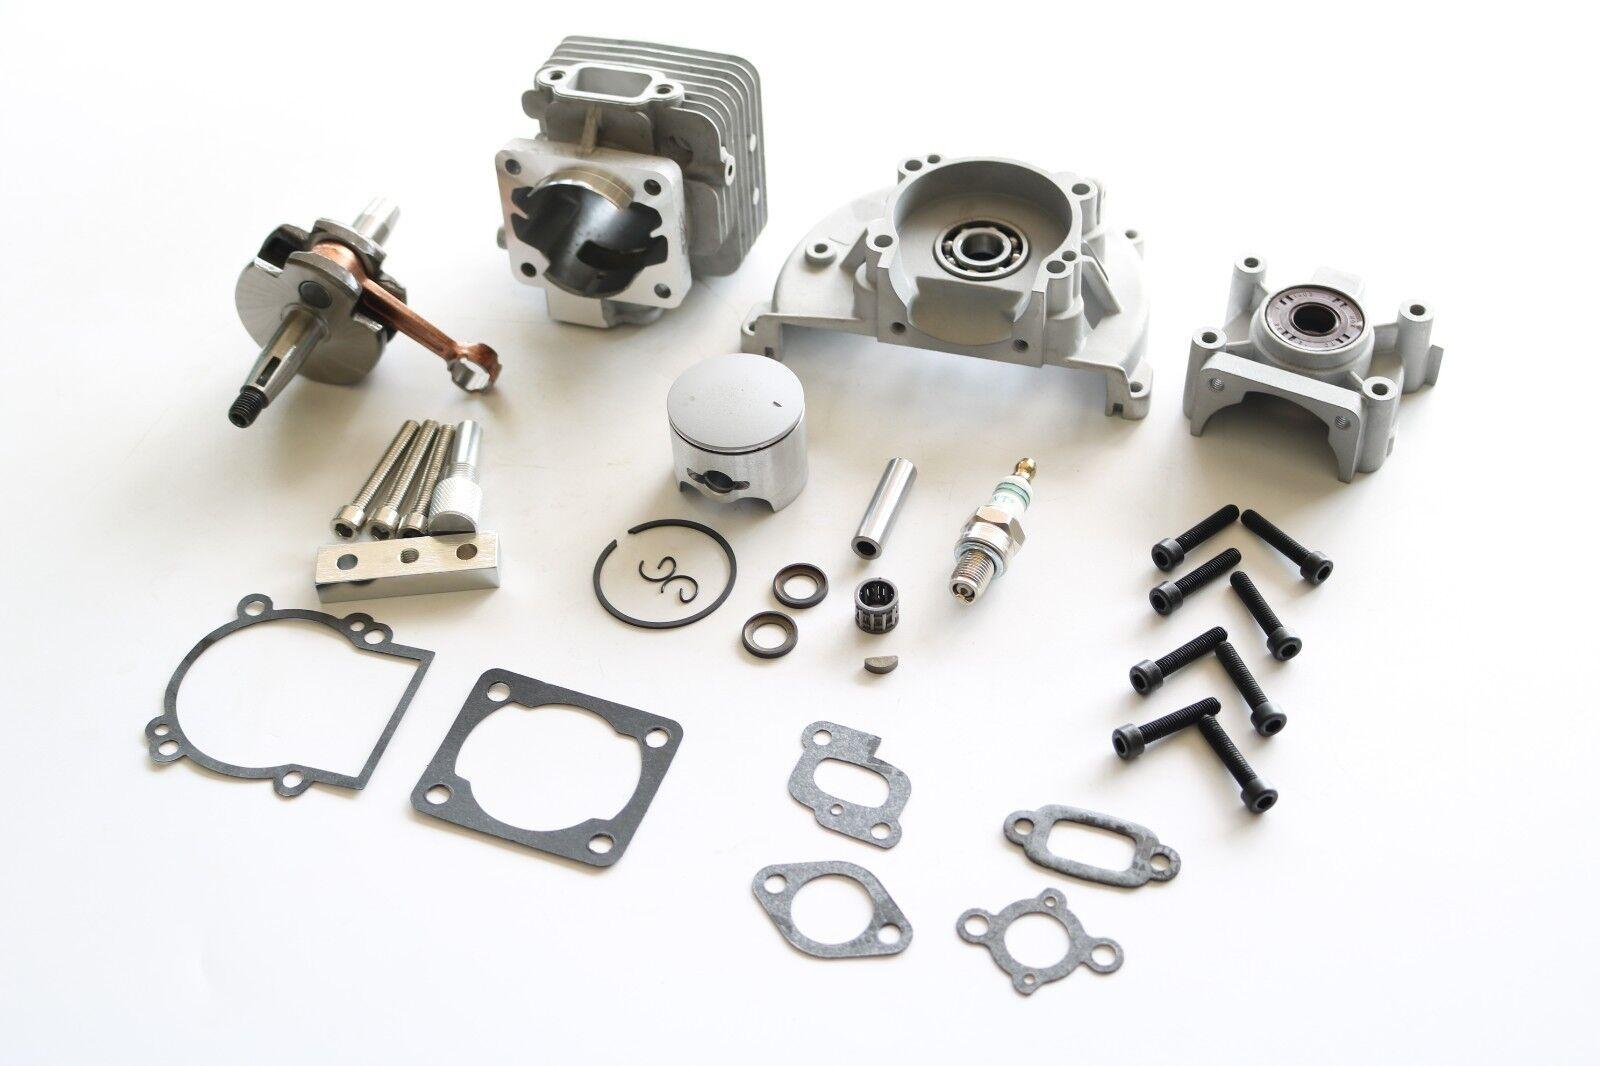 32cc 2 stroke 4 Bolt upgrade engine kit Fits HPI BAJA 5B 5T SC Losi 5ive T Rovan